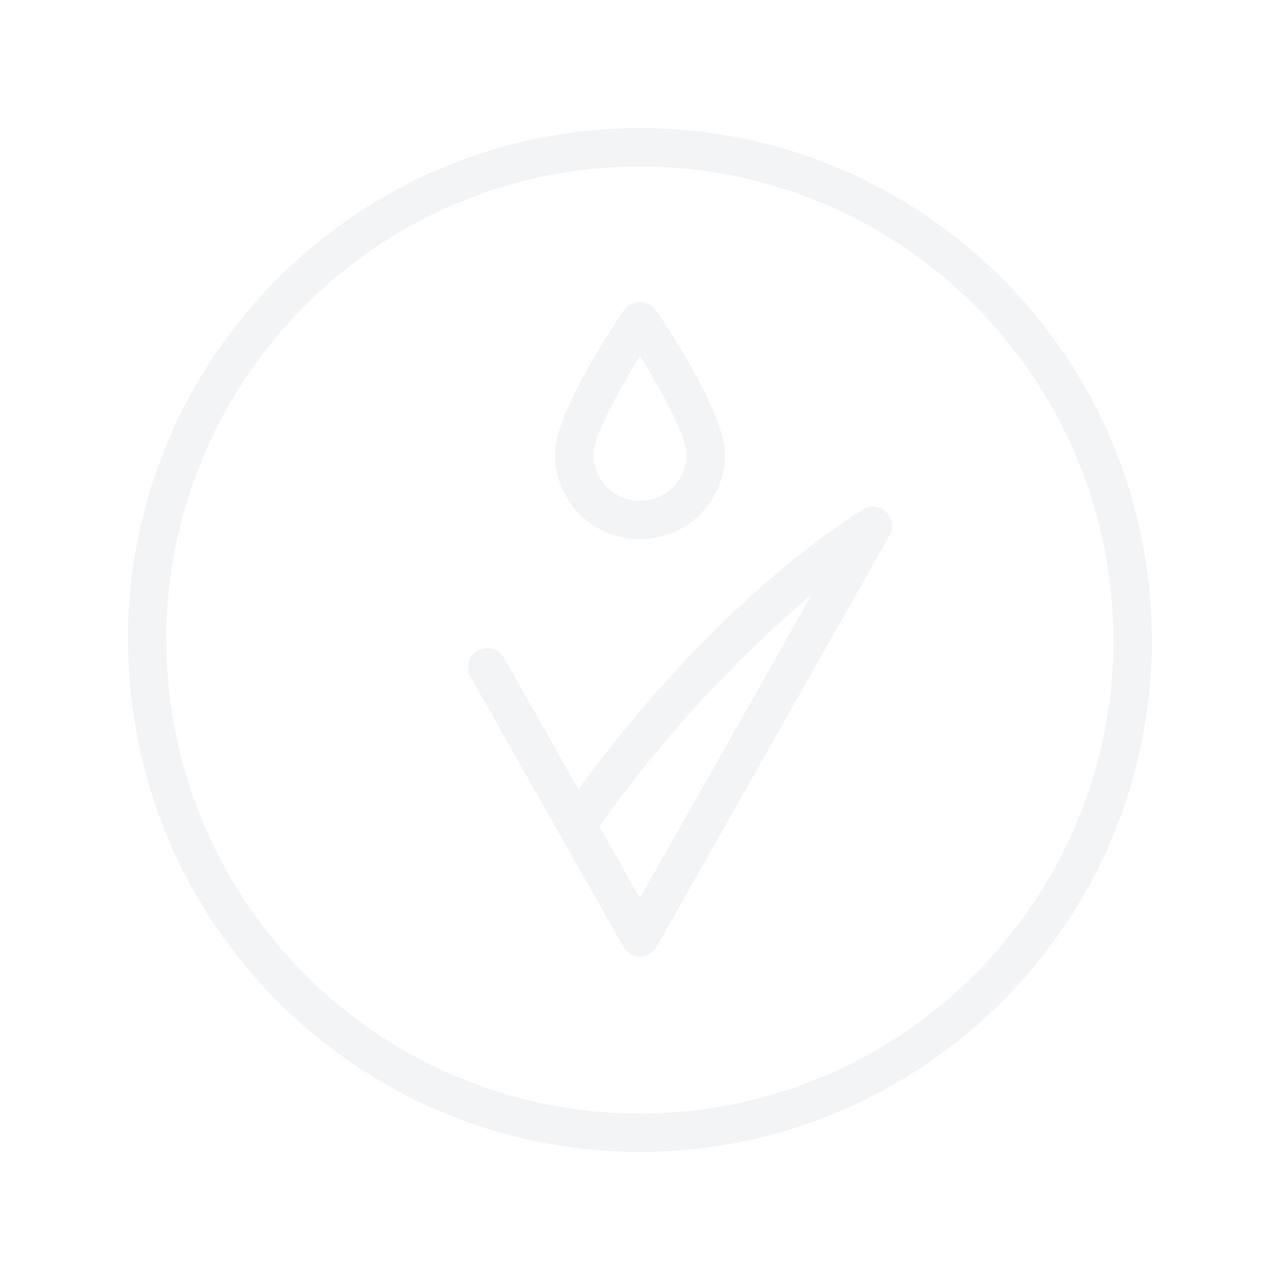 Dior Diorskin Nude Air Loose Powder 16g